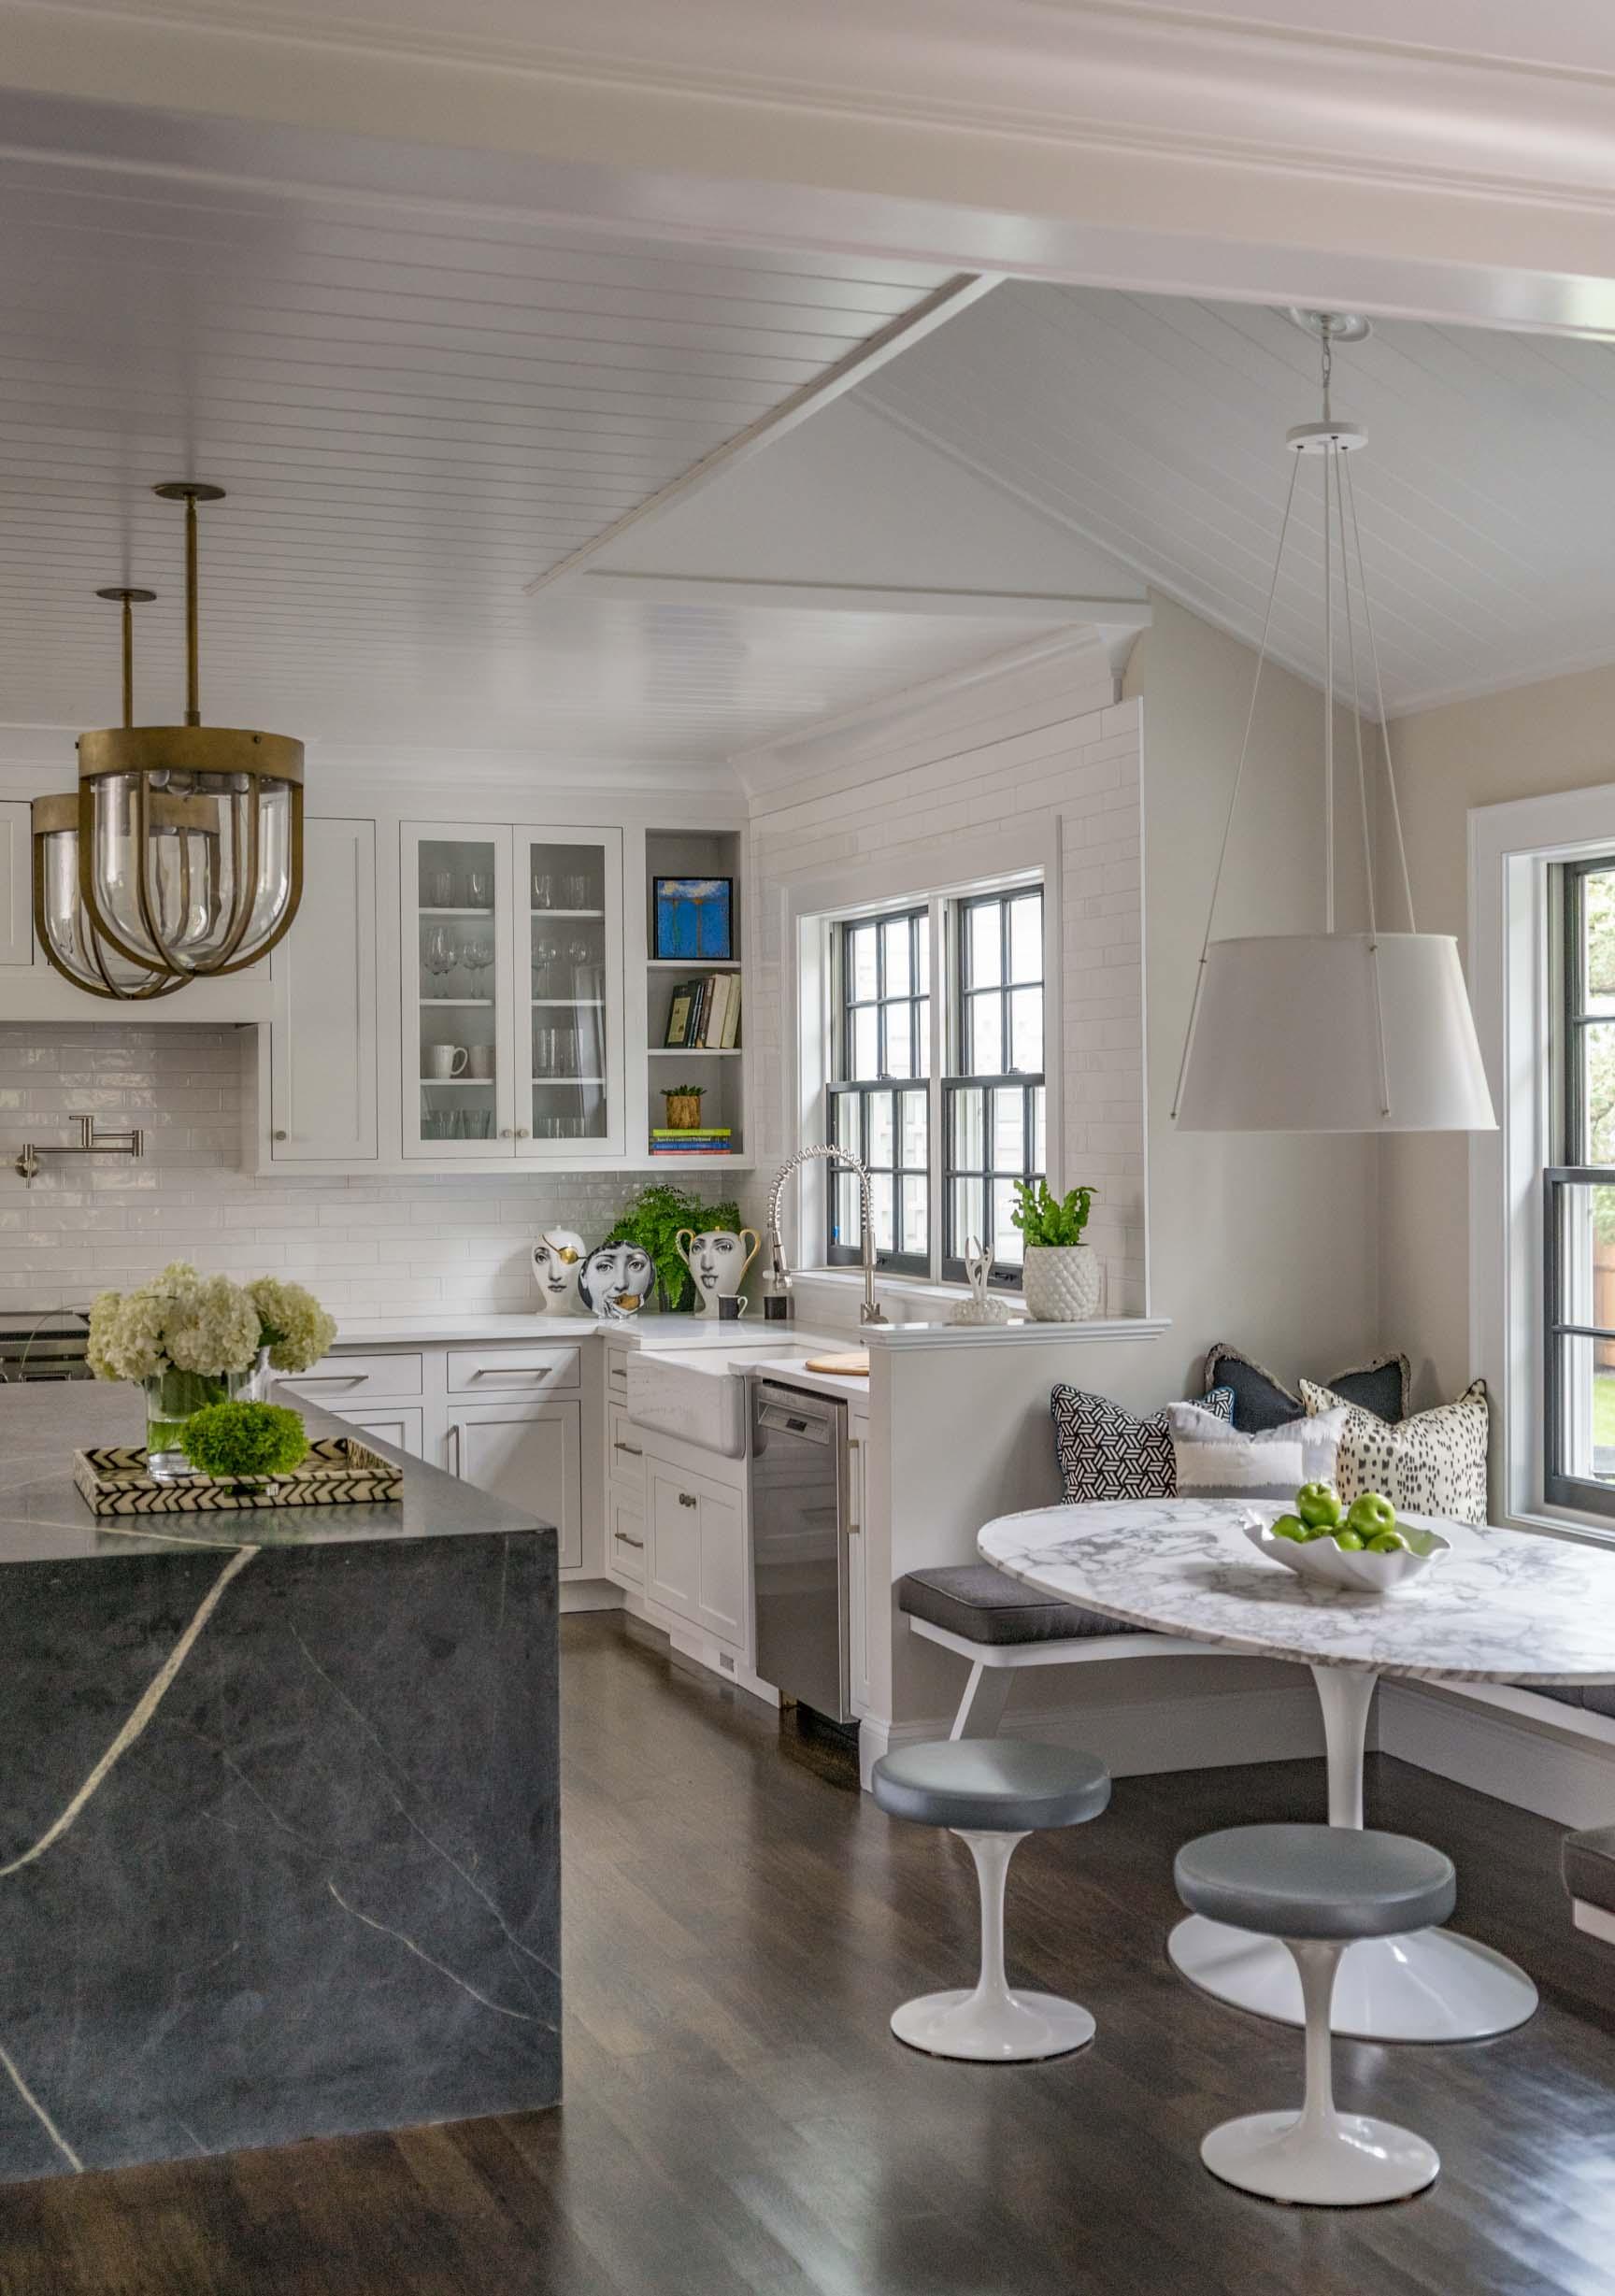 kitchen-by-liz-caan-interior-design-Dover-Dr-Wellesley